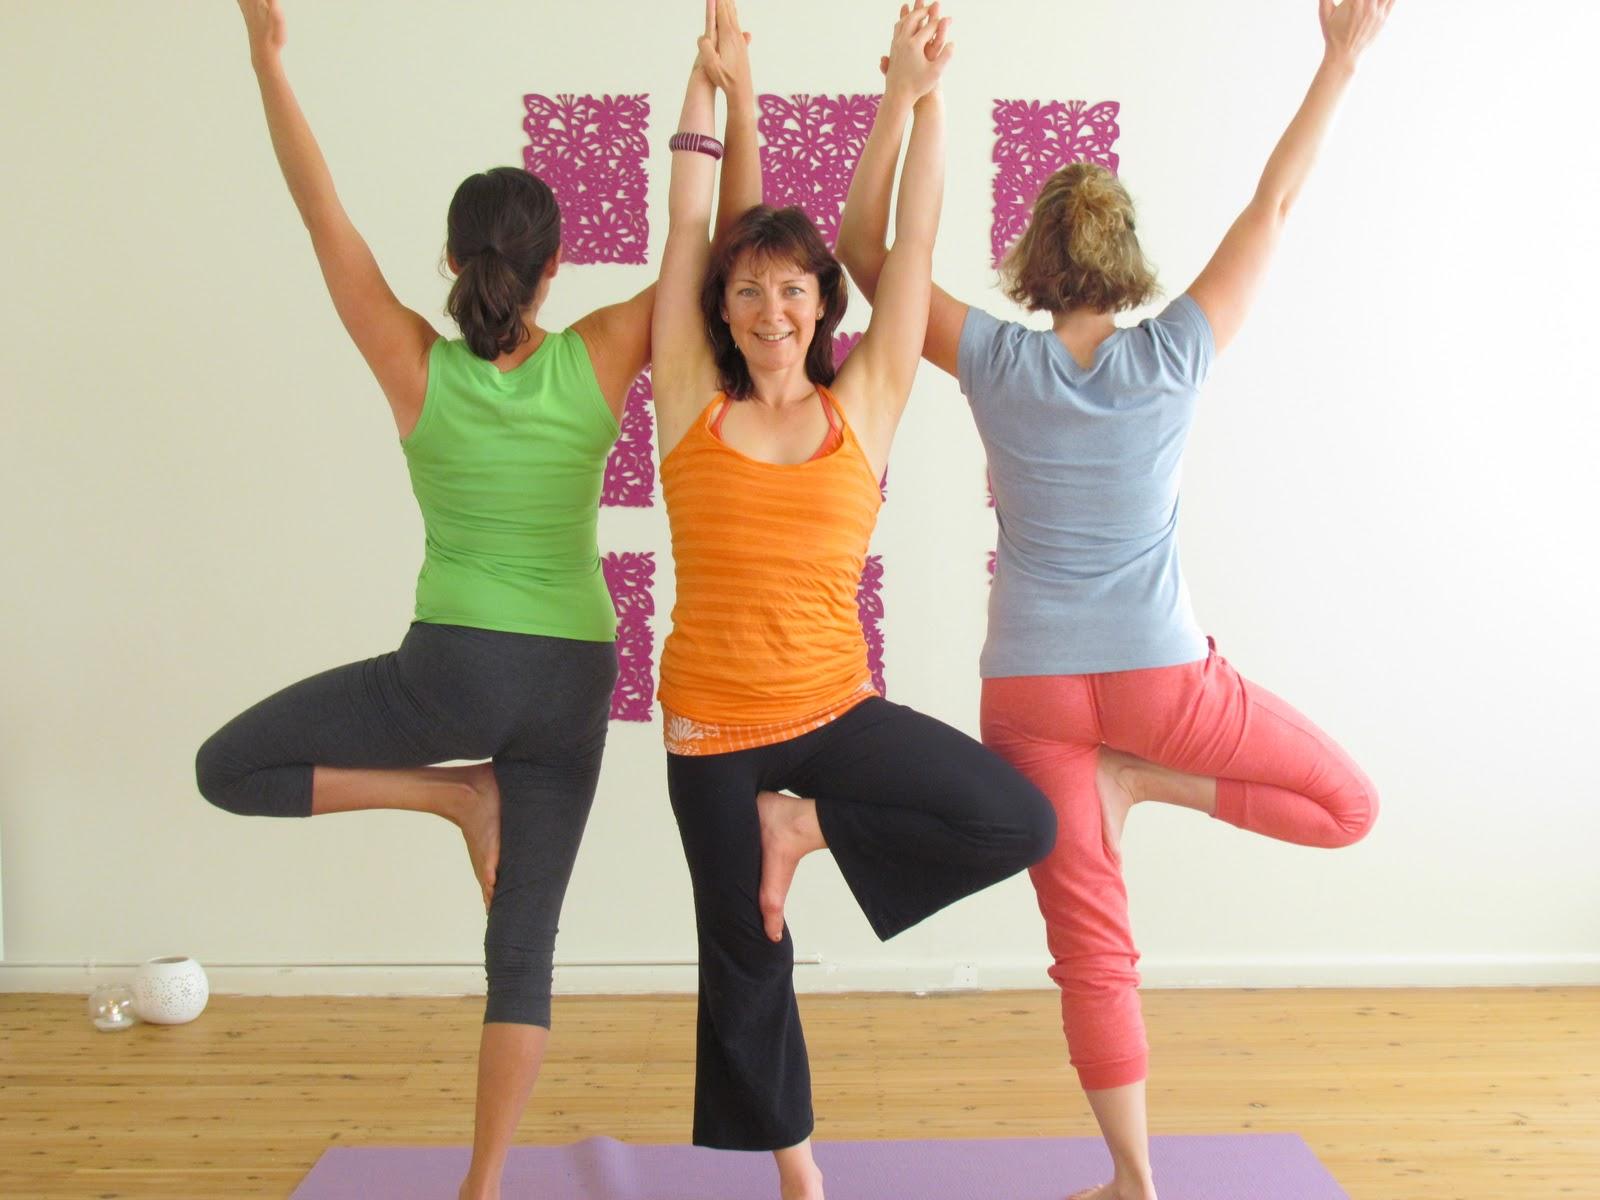 three people yoga challenge poses